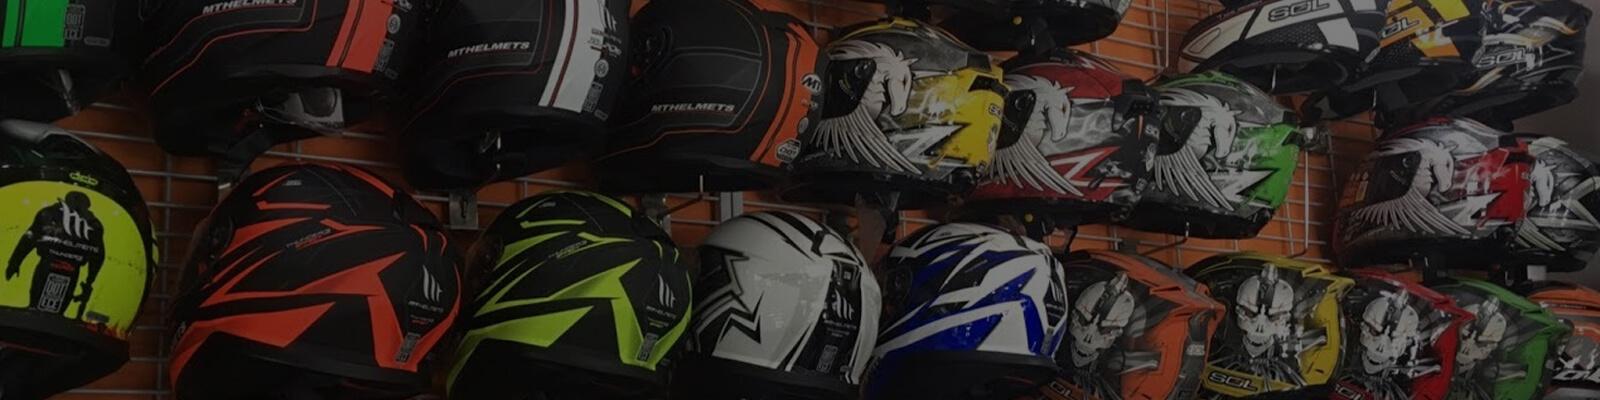 group-of-helmets